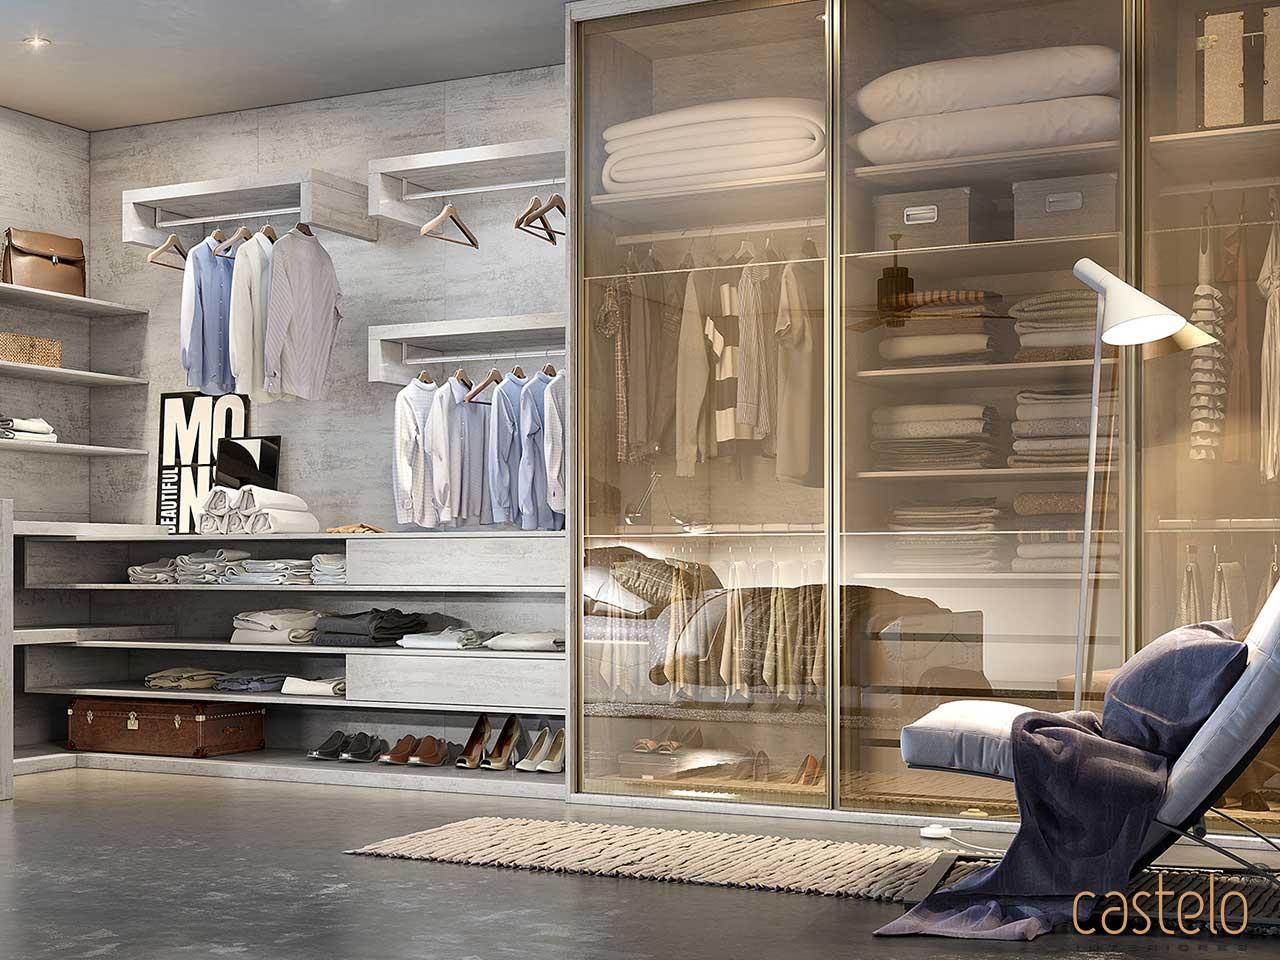 castelo-interiores-closet1